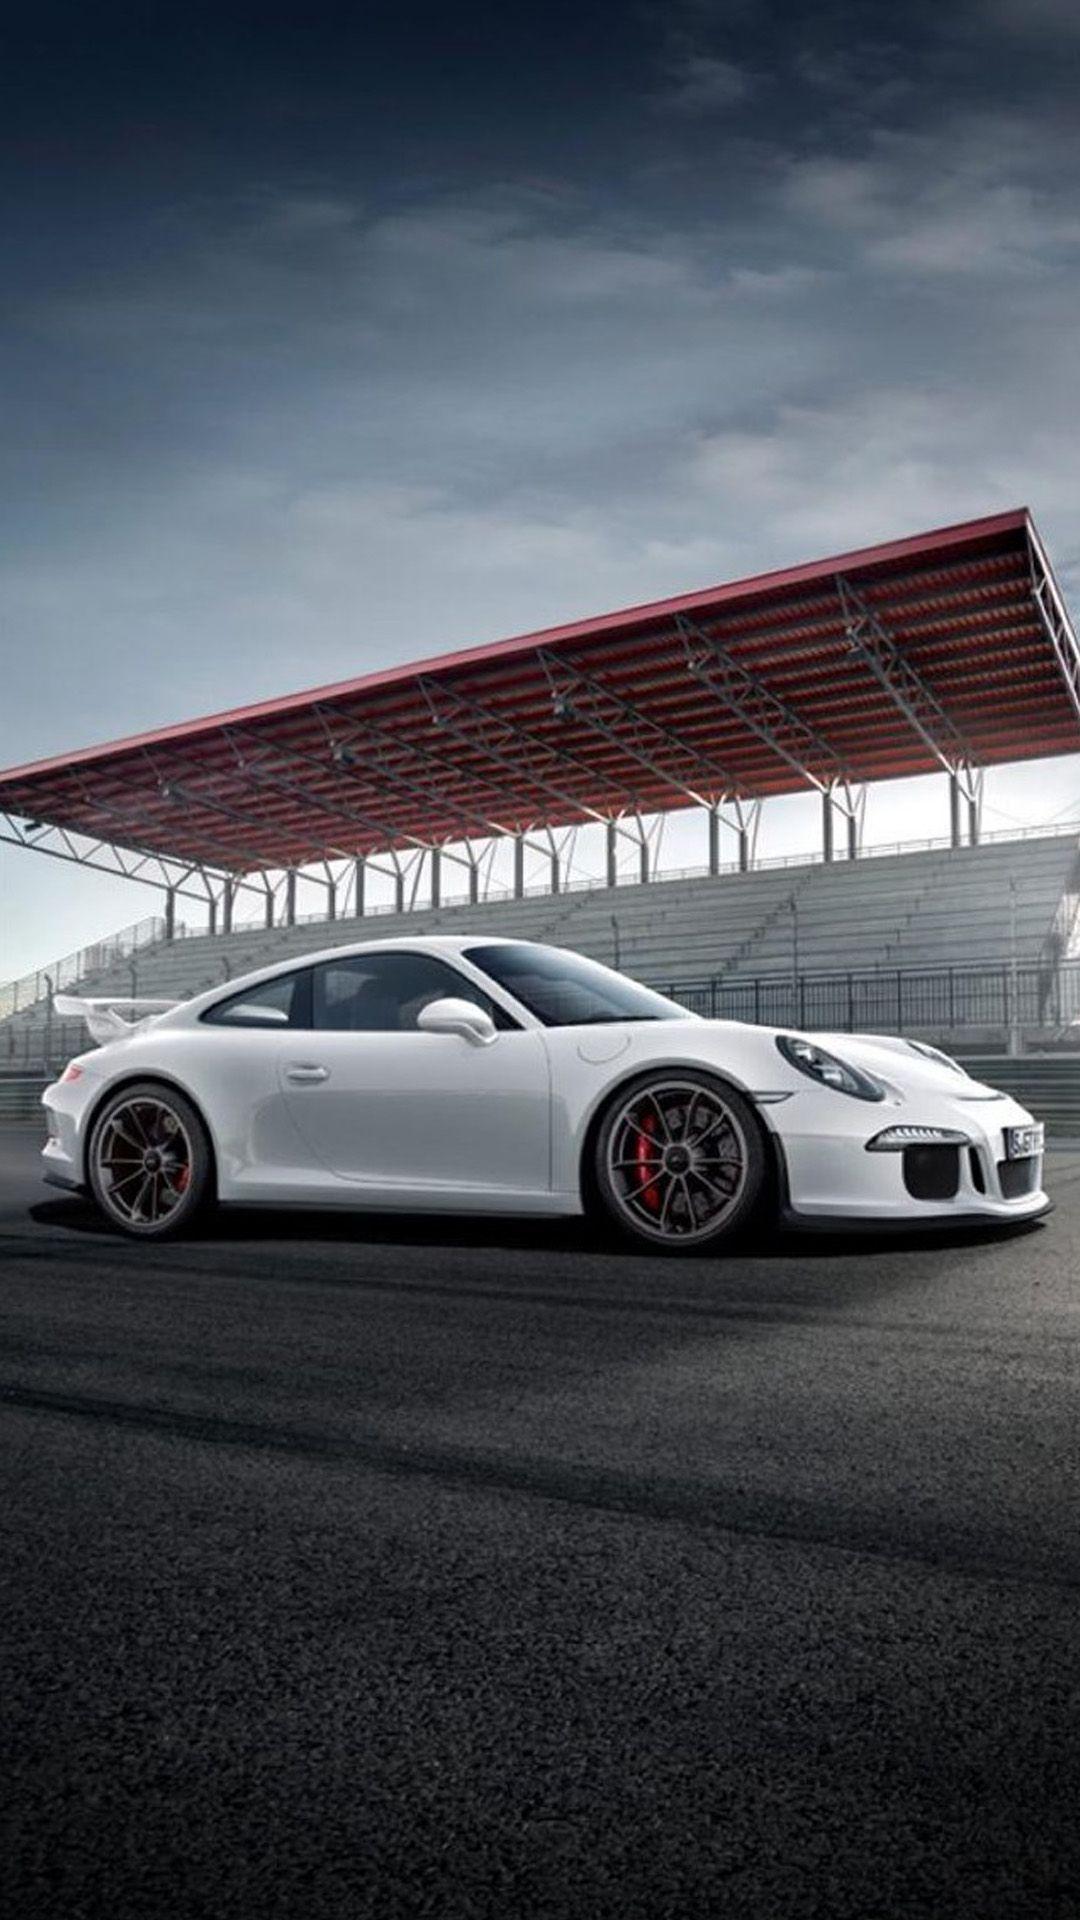 Porsche Gt3 Rs Wallpaper For Iphone Car Wallpaper Iphone 7 Plus 1080x1920 Wallpaper Teahub Io